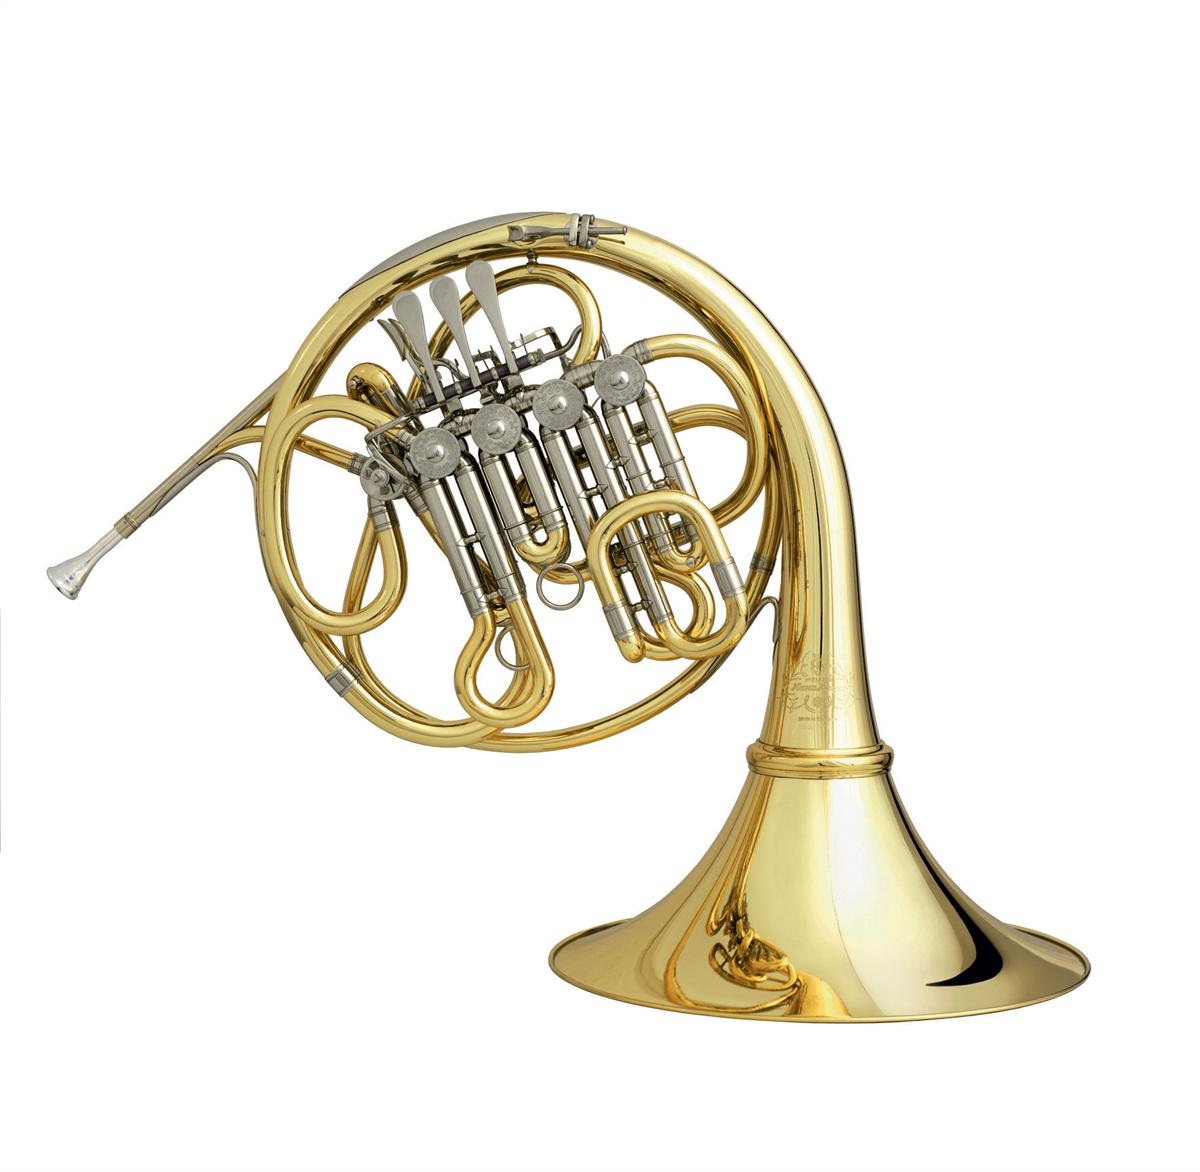 Hans Hoyer Bb/High F Discant Hoorn RT91GA-L - Orchestra/Custom